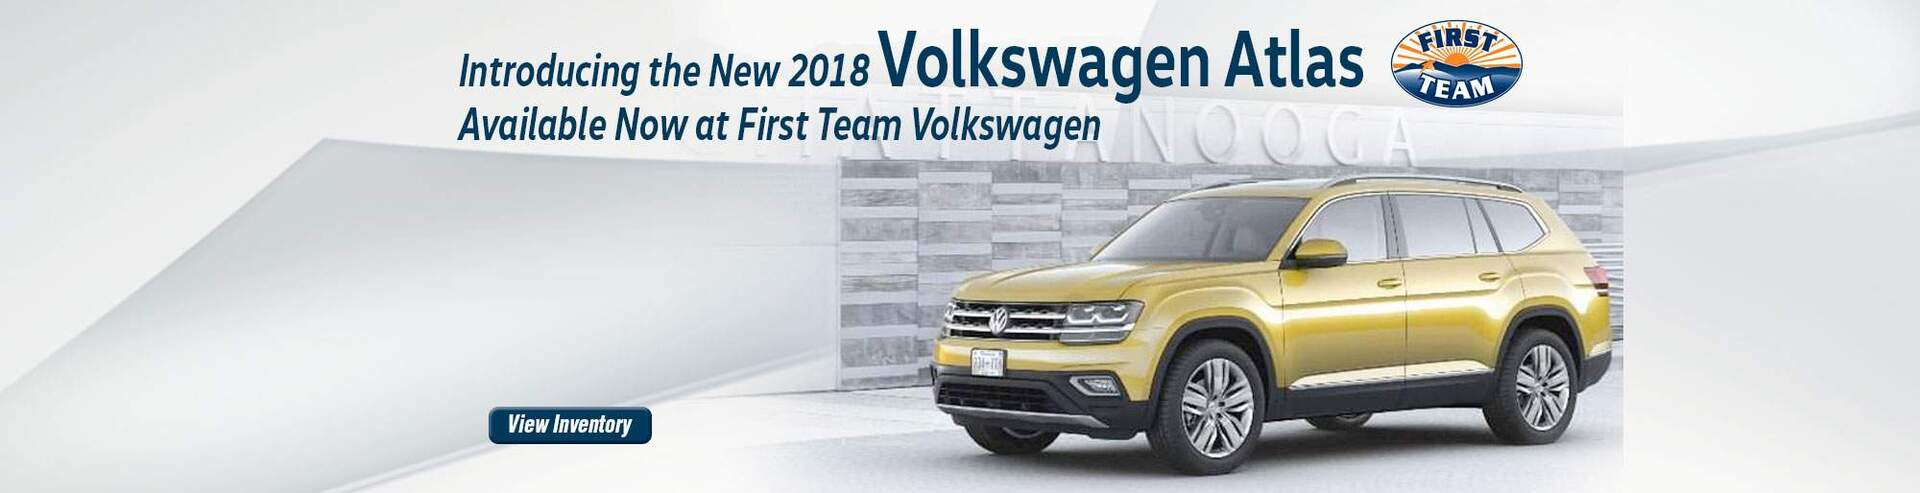 Volkswagen Dealership Roanoke VA Used Cars First Team VW